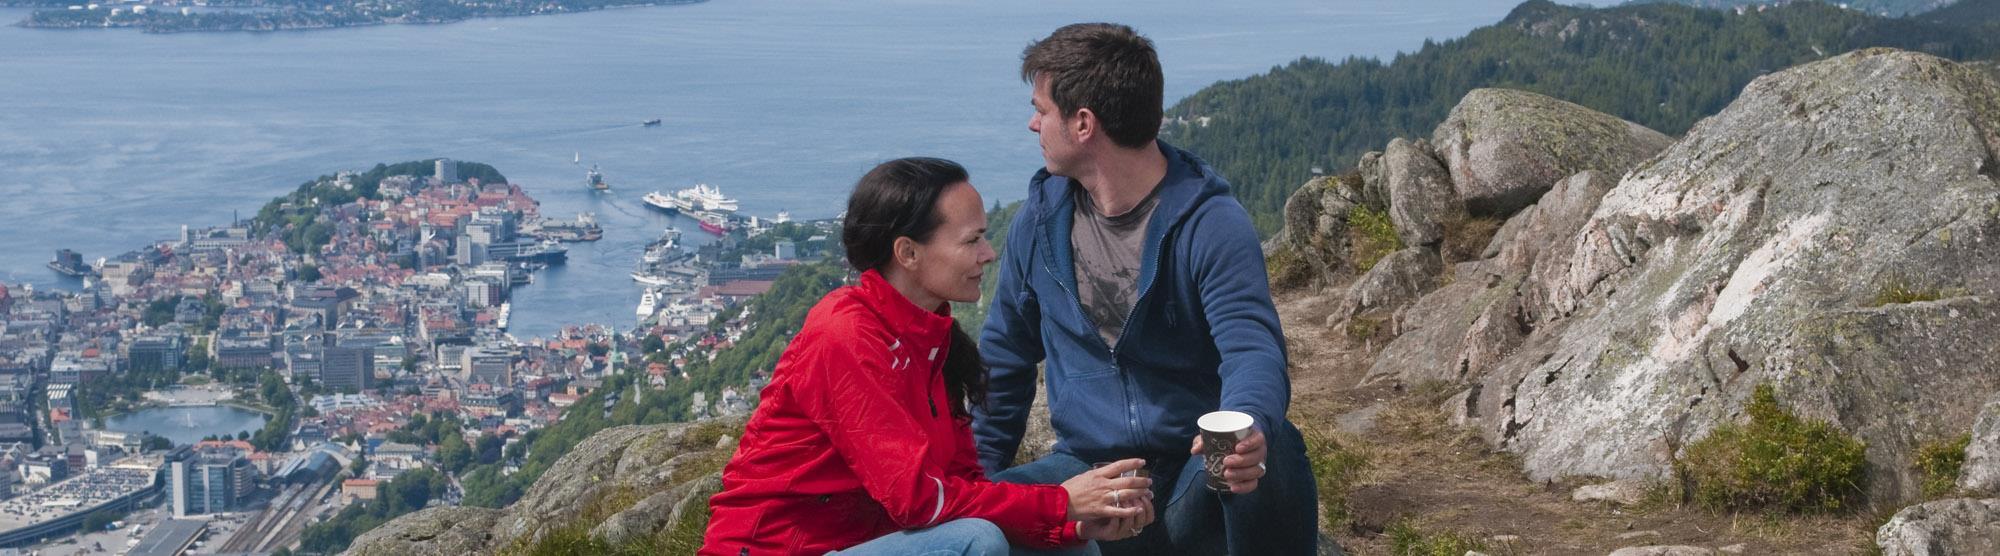 Fjelltur på de syv fjell i Bergen